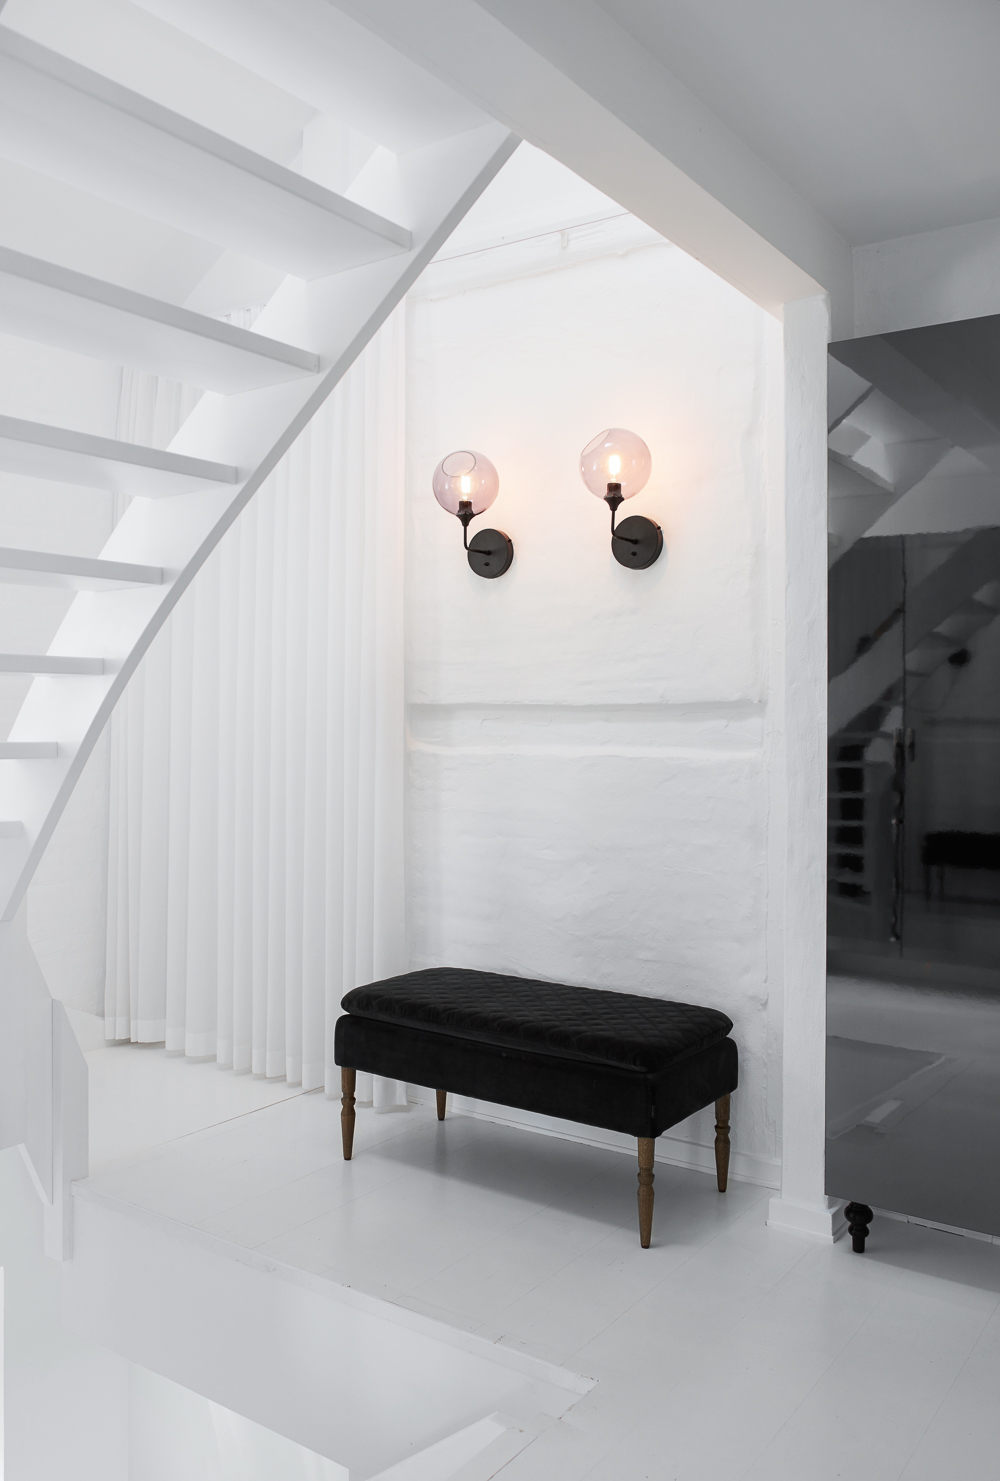 Marie-Burgos-Design.Ballroom-The-Wall.Interior-White.MBcollection.jpg